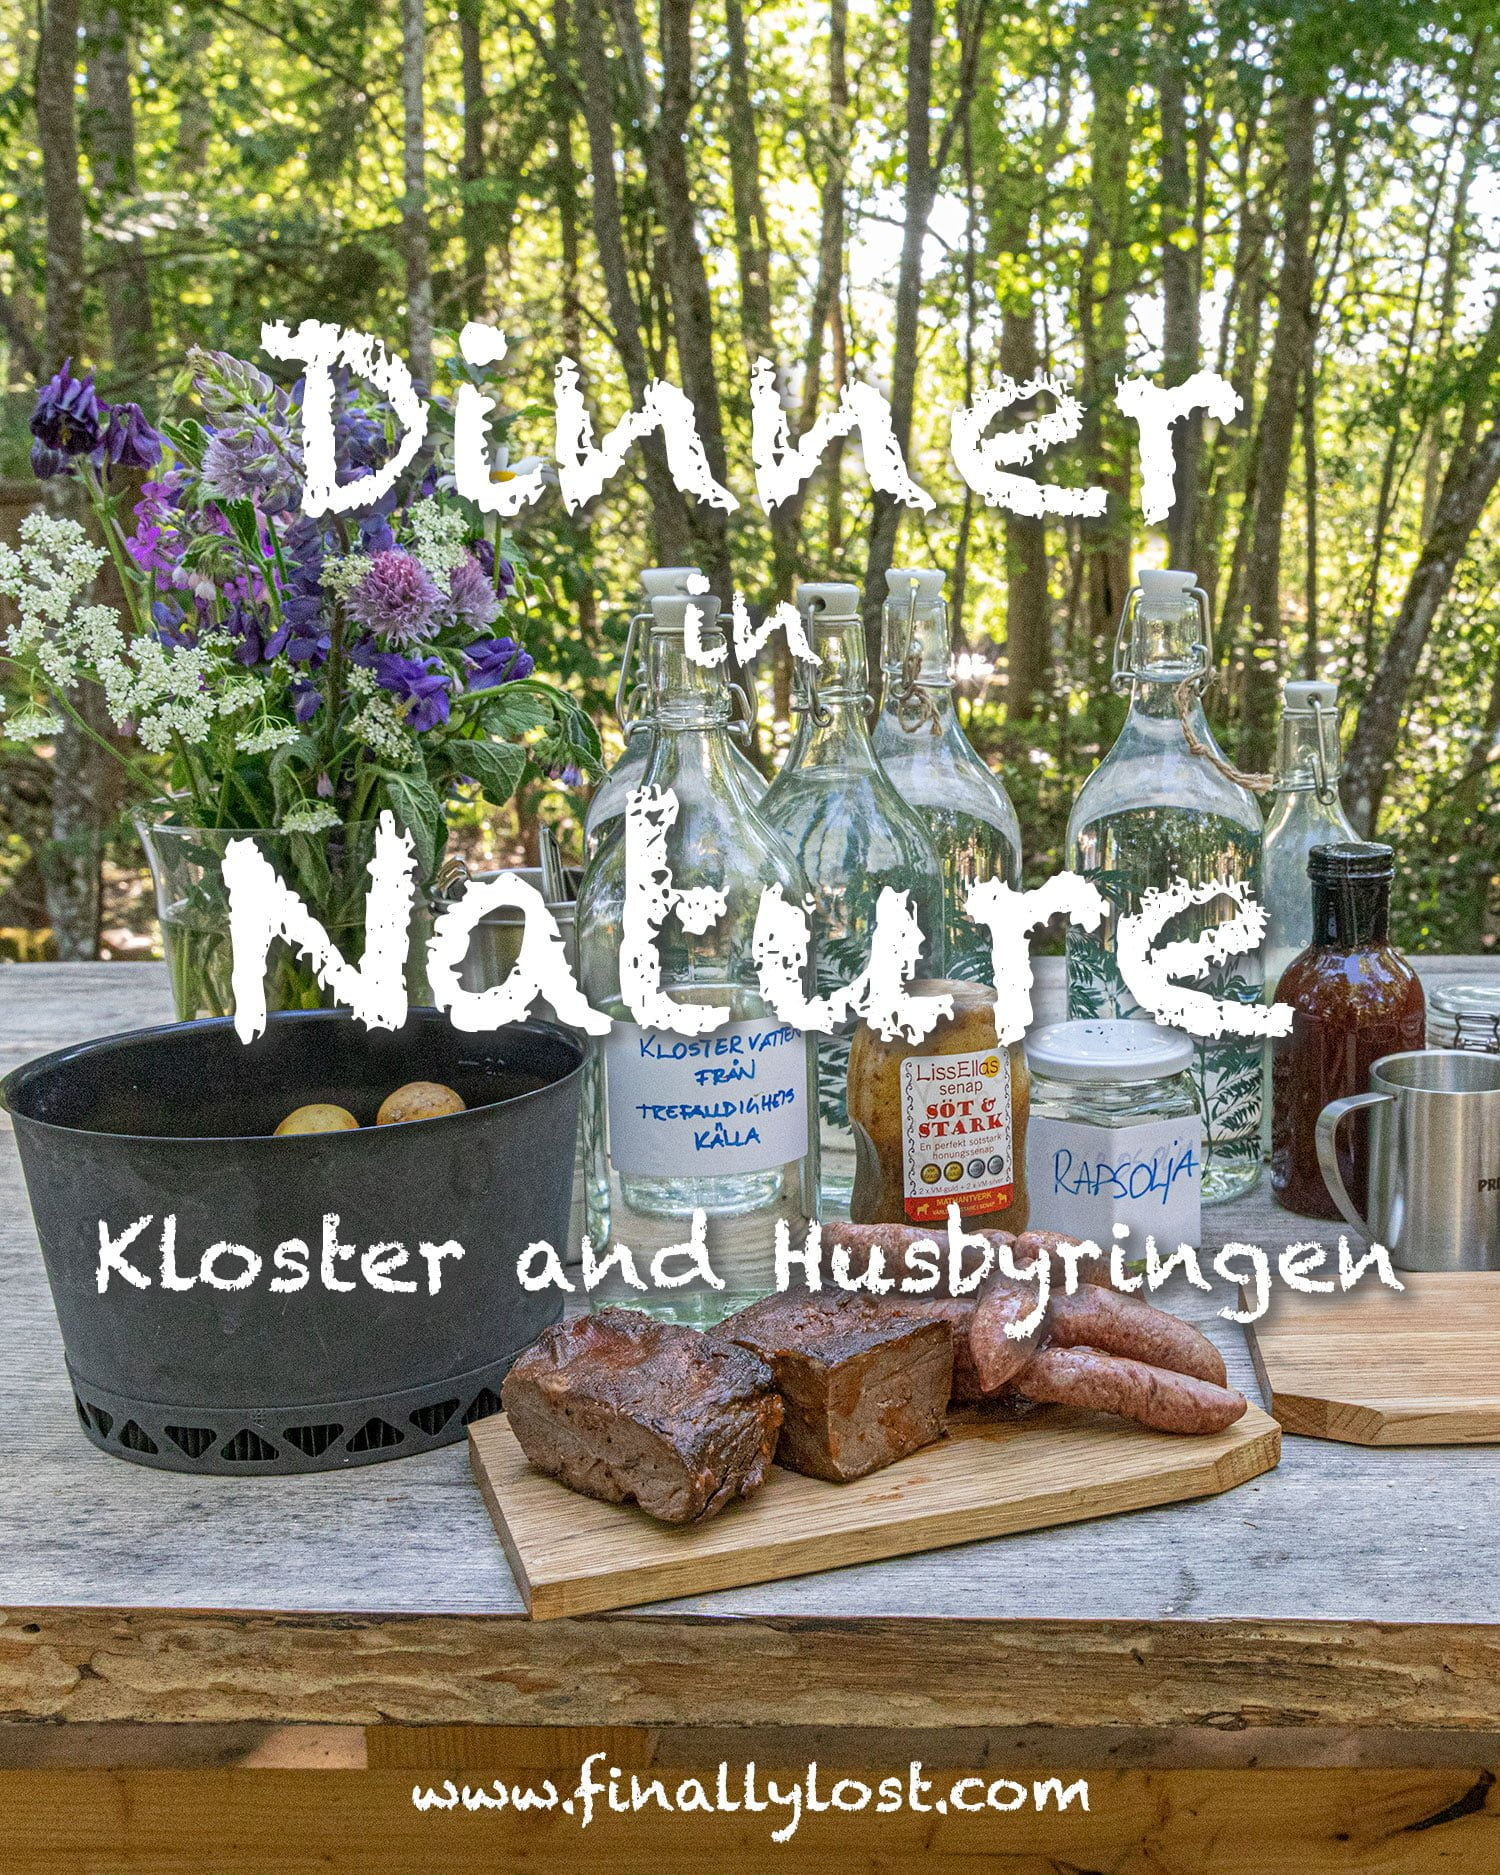 Dinner in Nature - The Edible Country - Taste of Dalarna